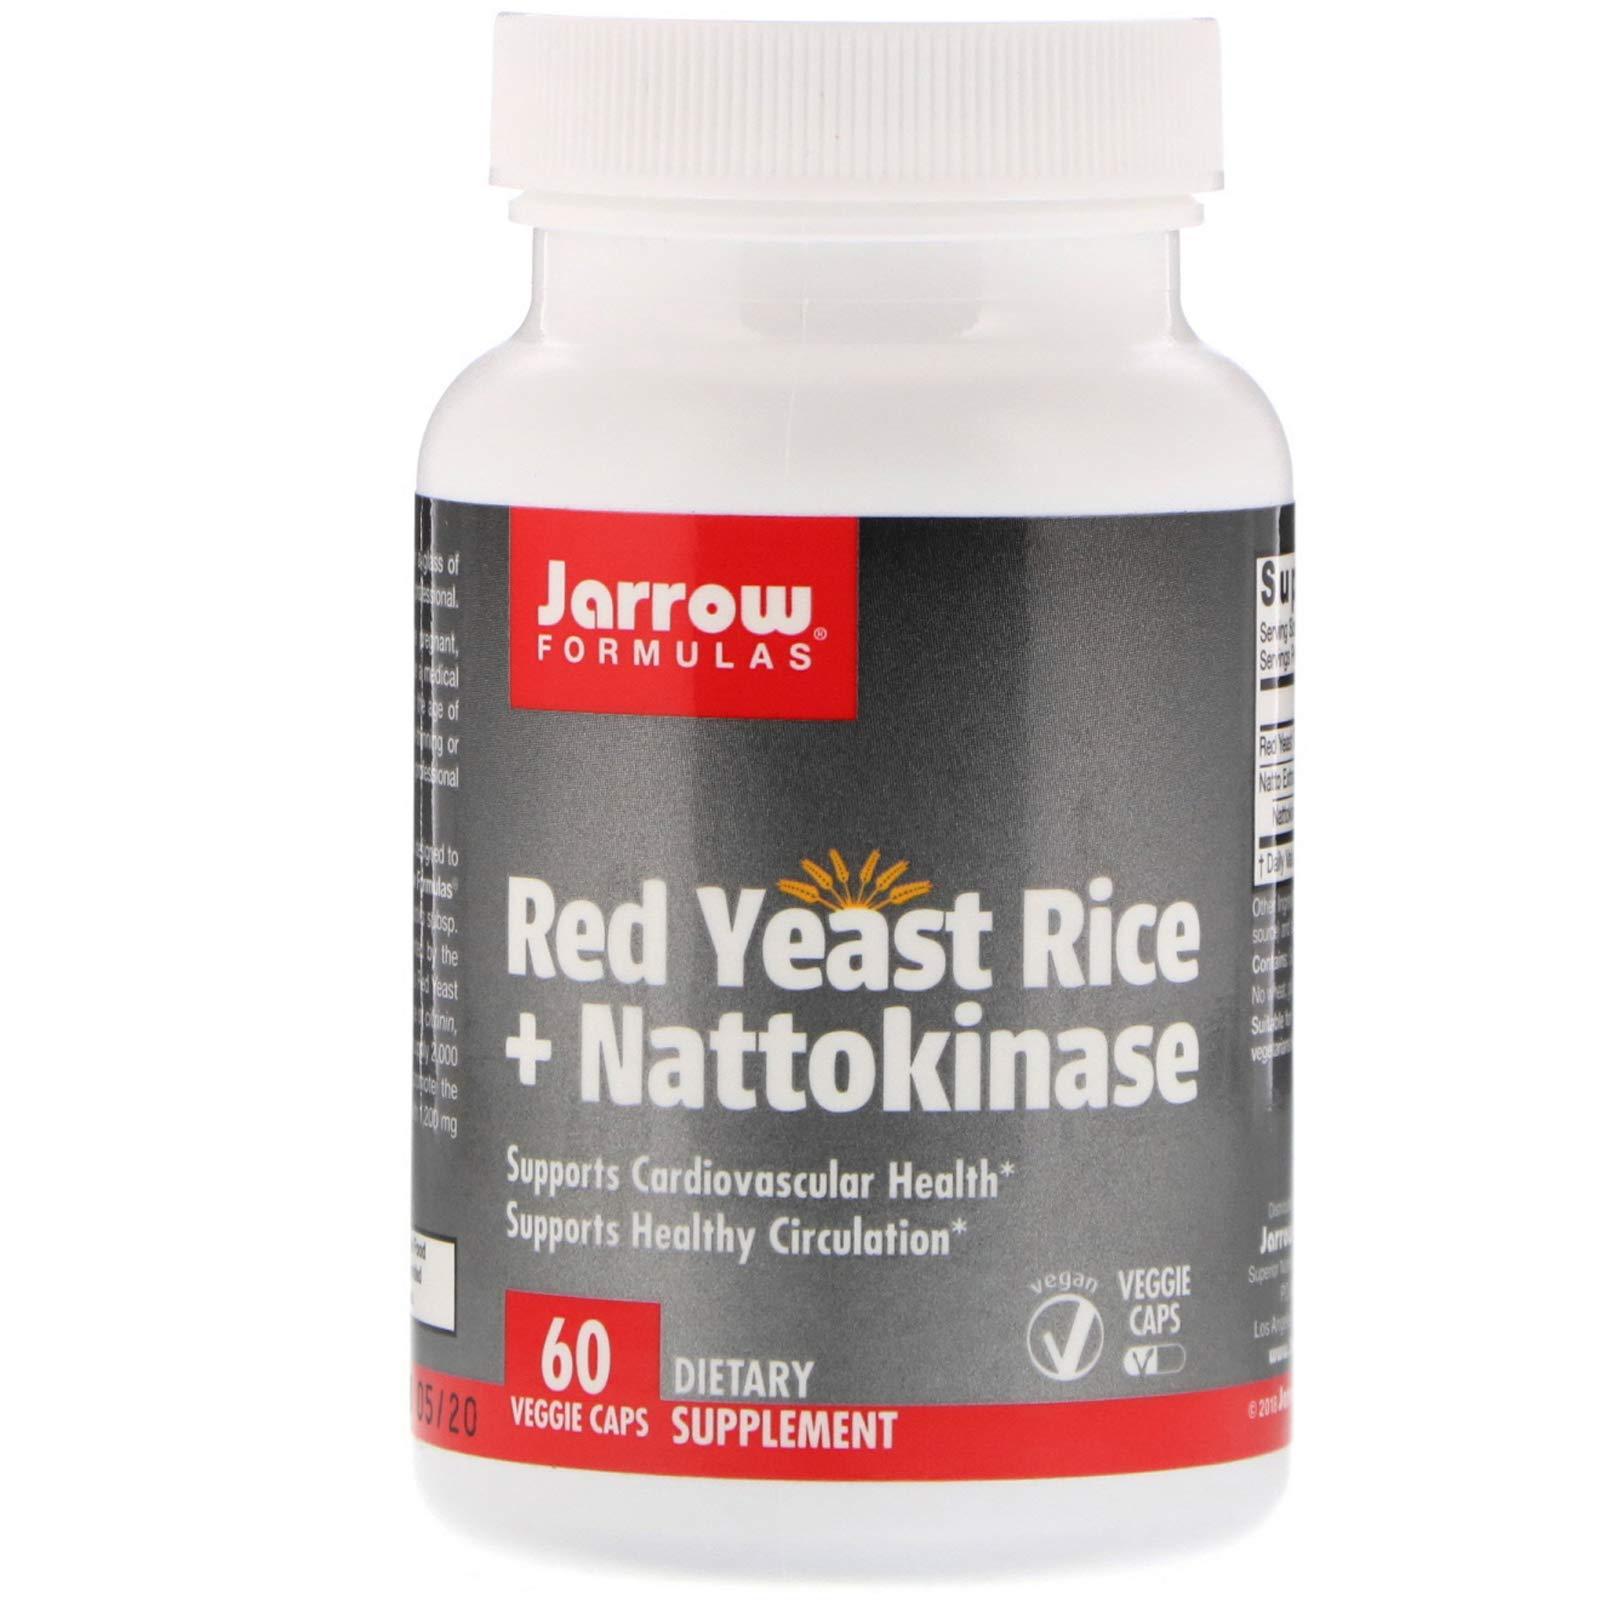 Jarrow Formulas, Red Yeast Rice + Nattokinase, 60 Veggie Caps